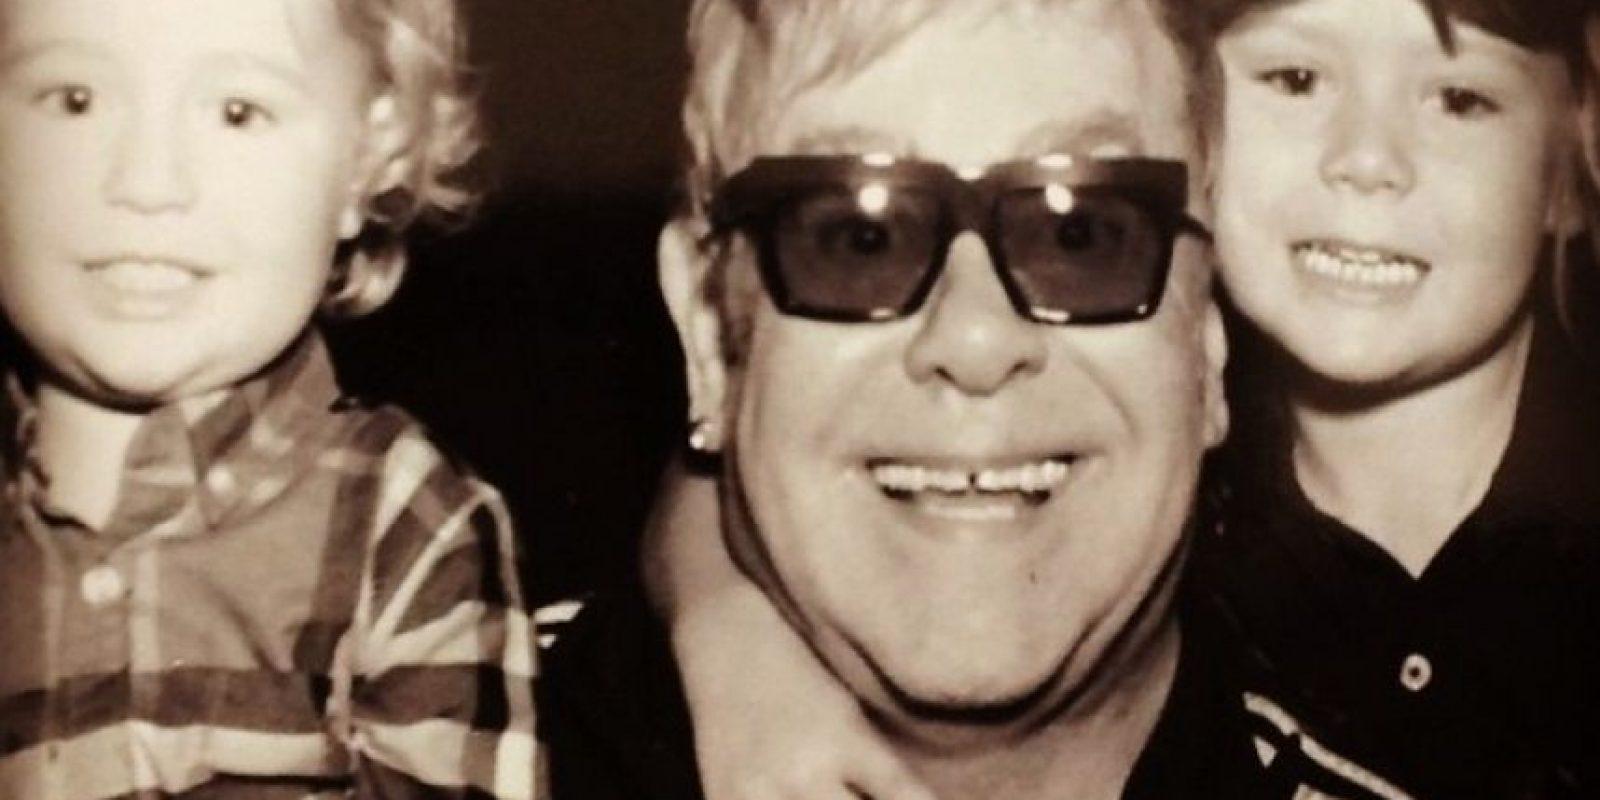 Elton John tiene dos hijos, Zachary Jackson Levon Furnish-John, Elijah Joseph Daniel Furnish-John Foto:Vía instagram.com/eltonjohn/. Imagen Por: